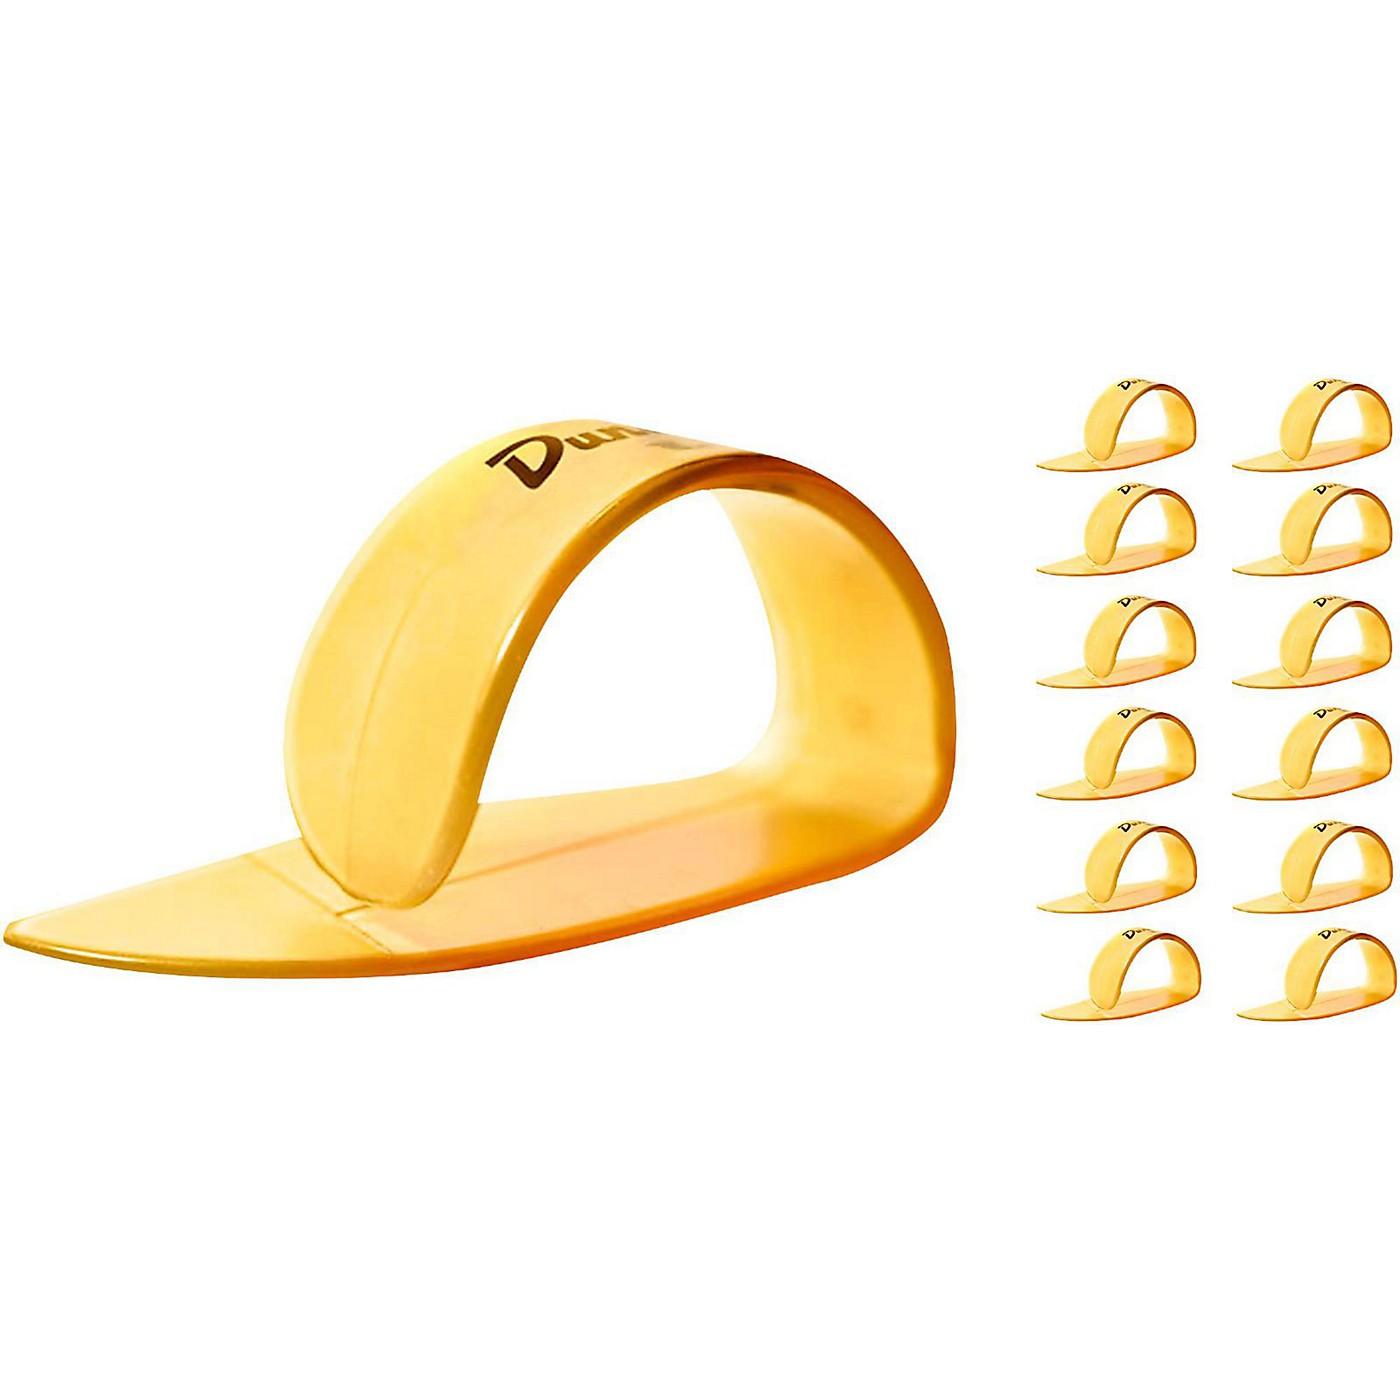 Dunlop Ultex Large Thumbpicks Gold (12-Pack) thumbnail